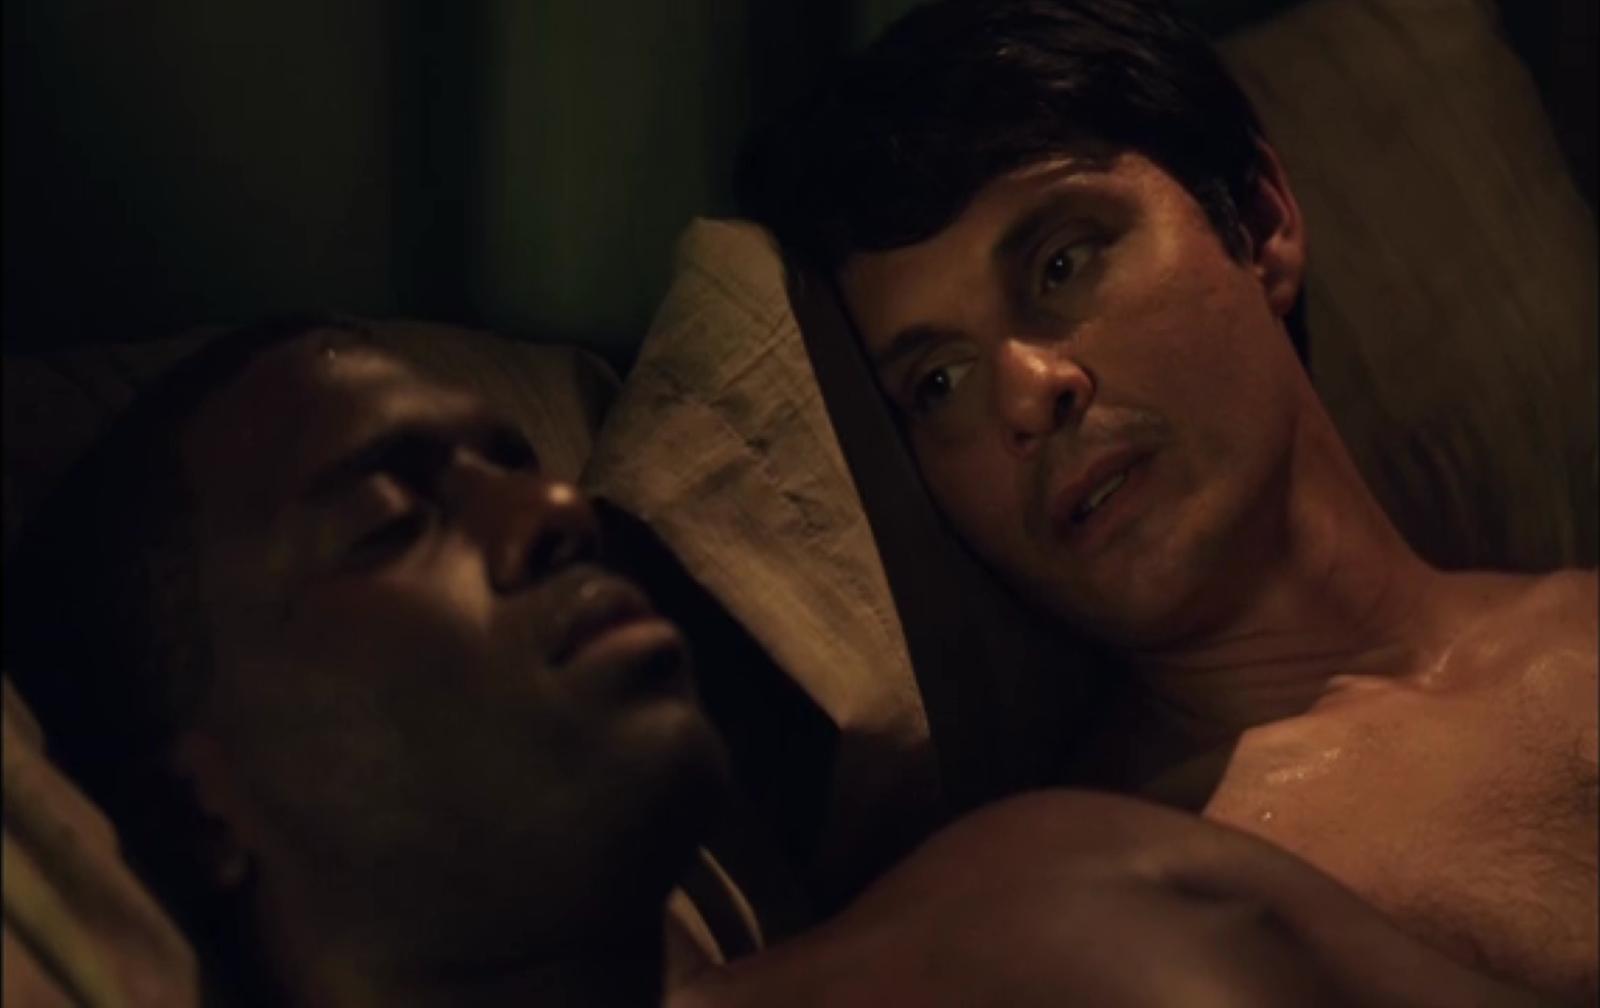 Beautiful Gay Men Sex Scenes 14